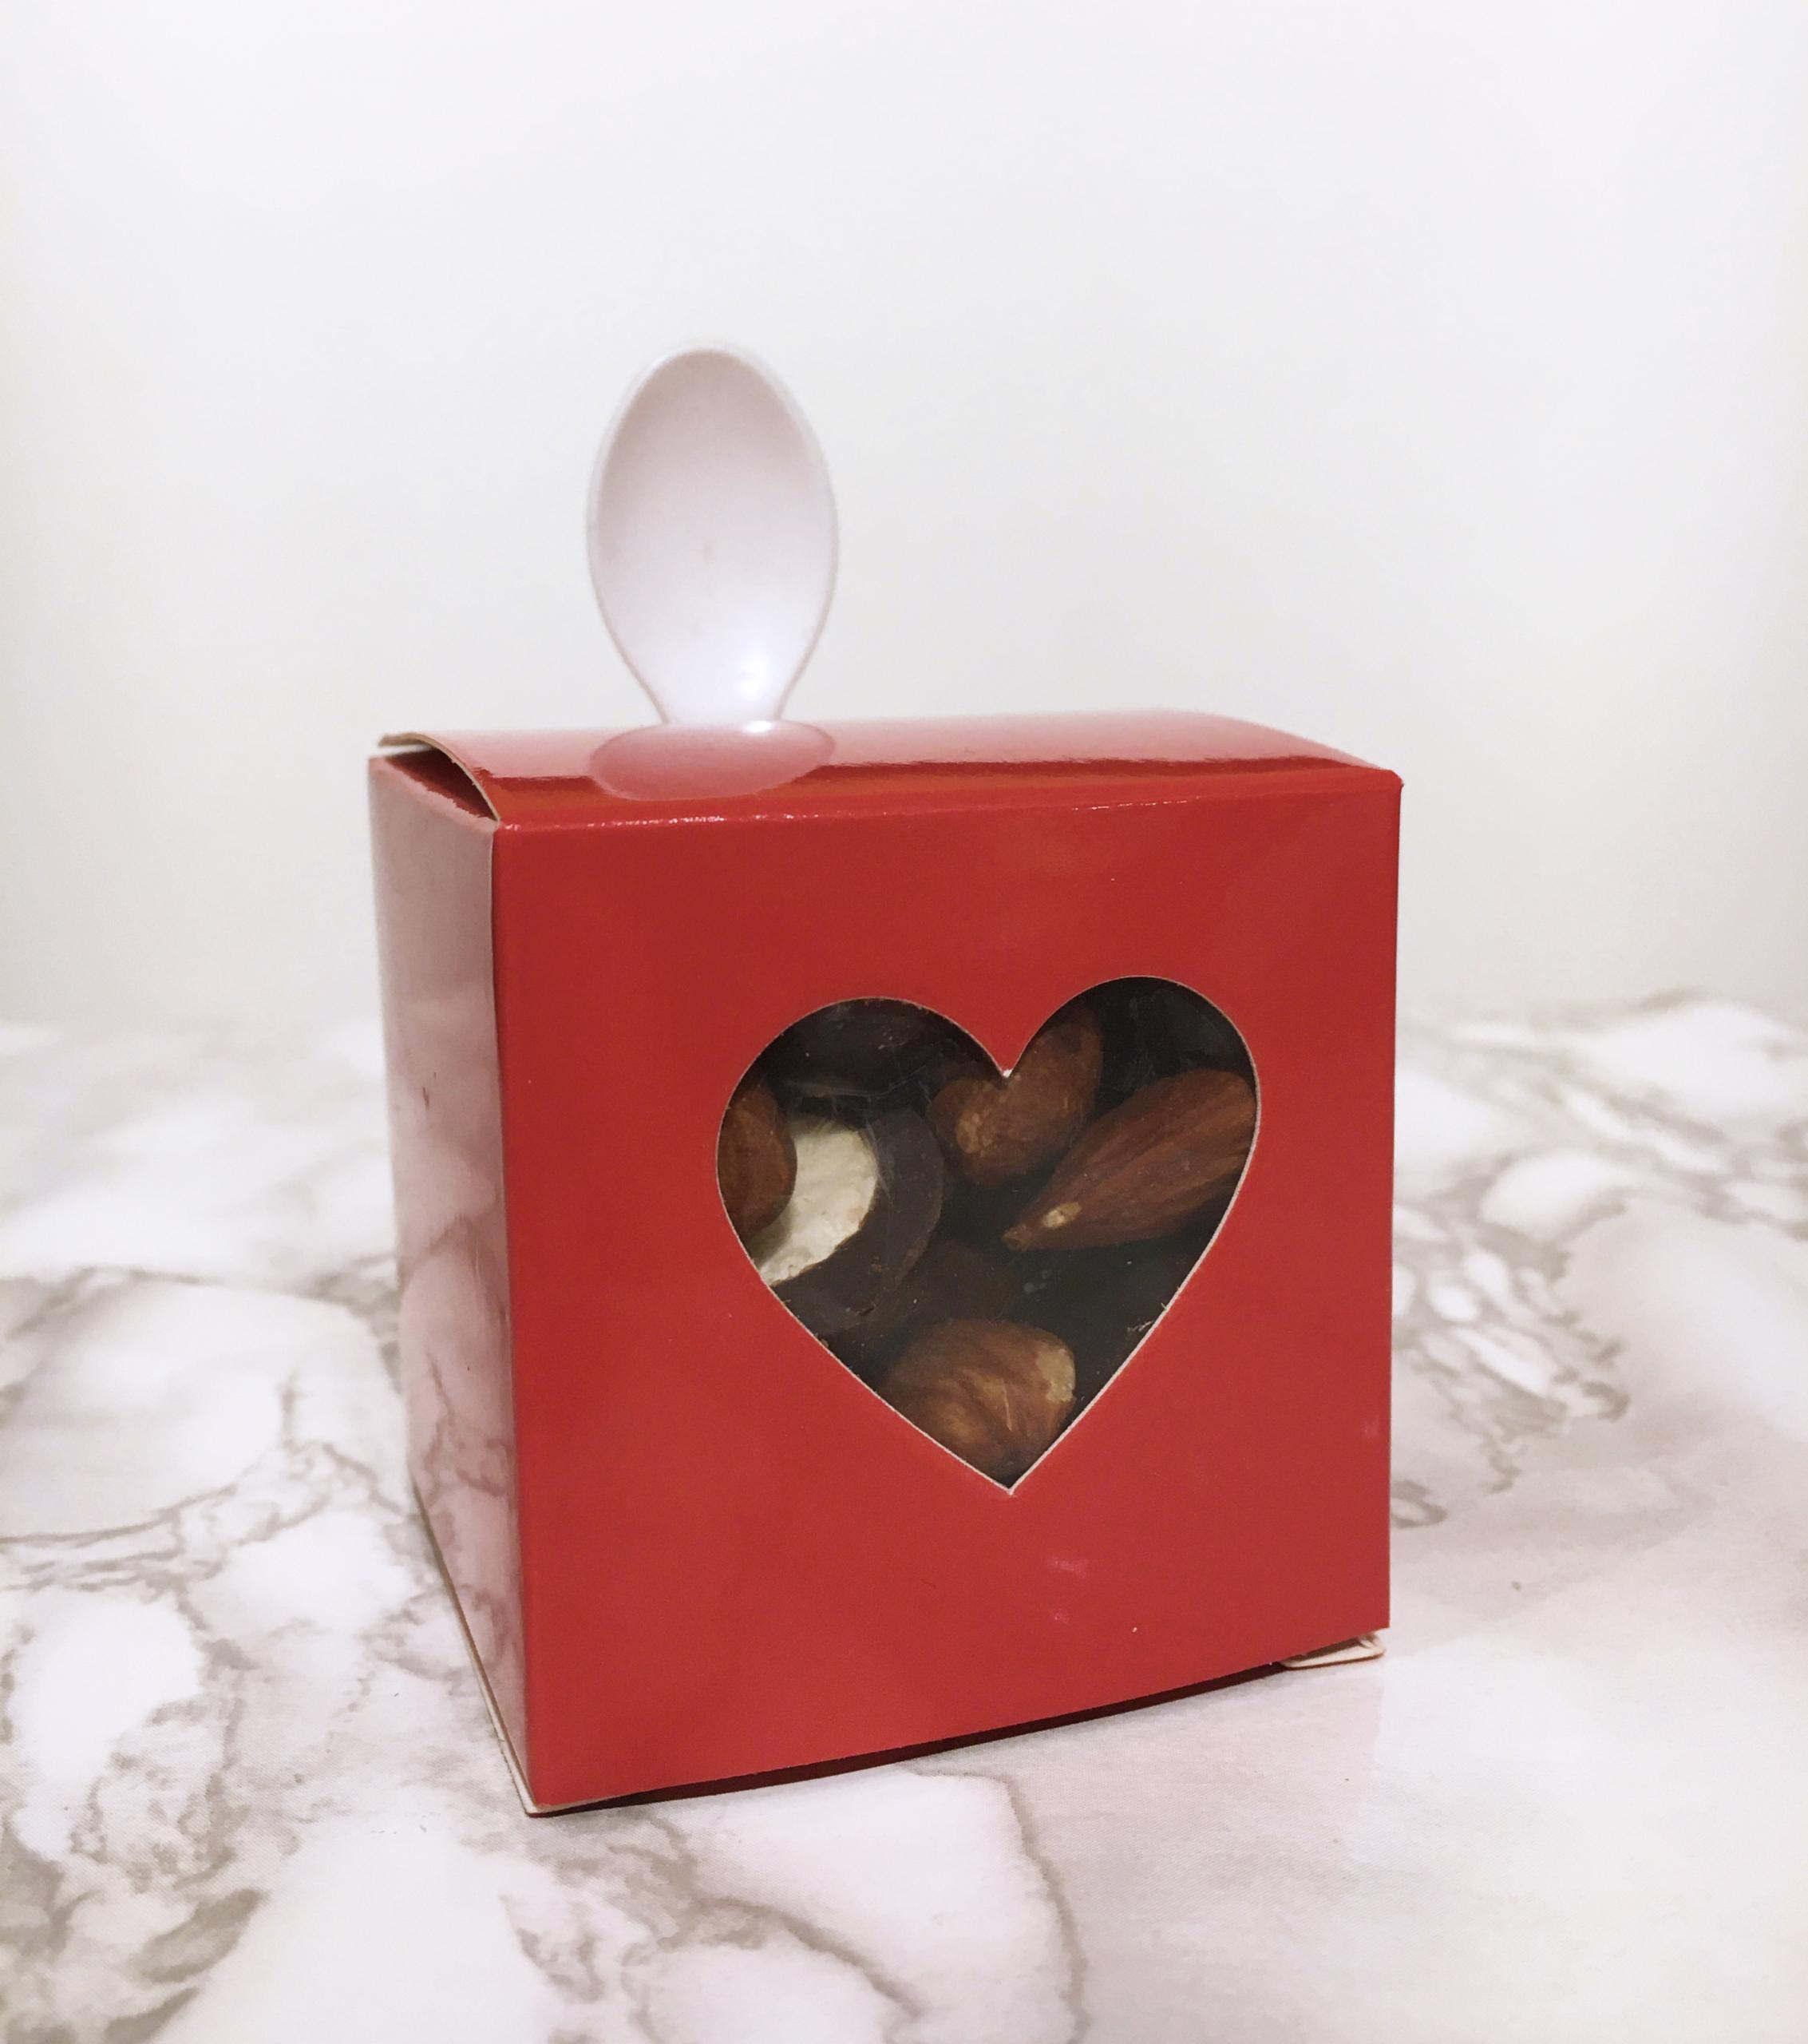 Sweetheart Box Cube (1 oz.), Min. 6 pcs.